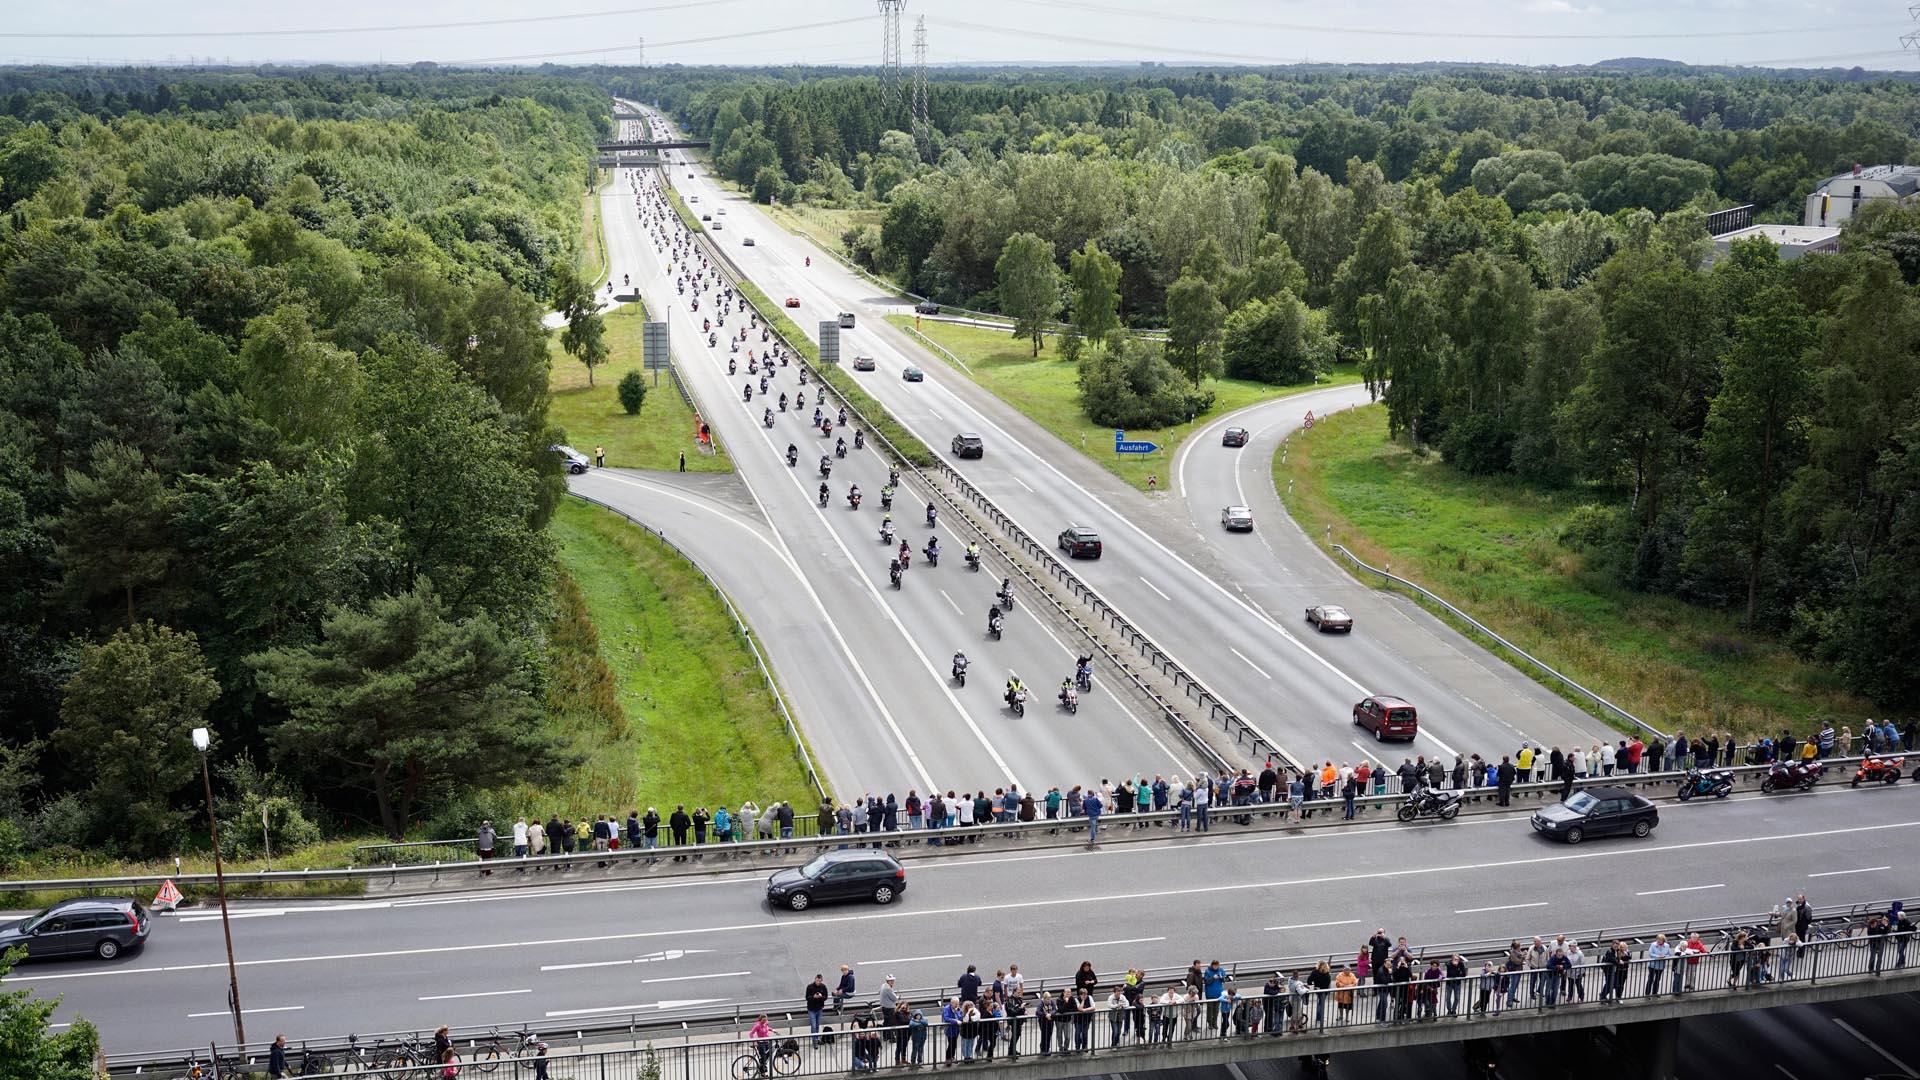 Konvoi nach dem Motorradgottesdienst in Hamburg 2014